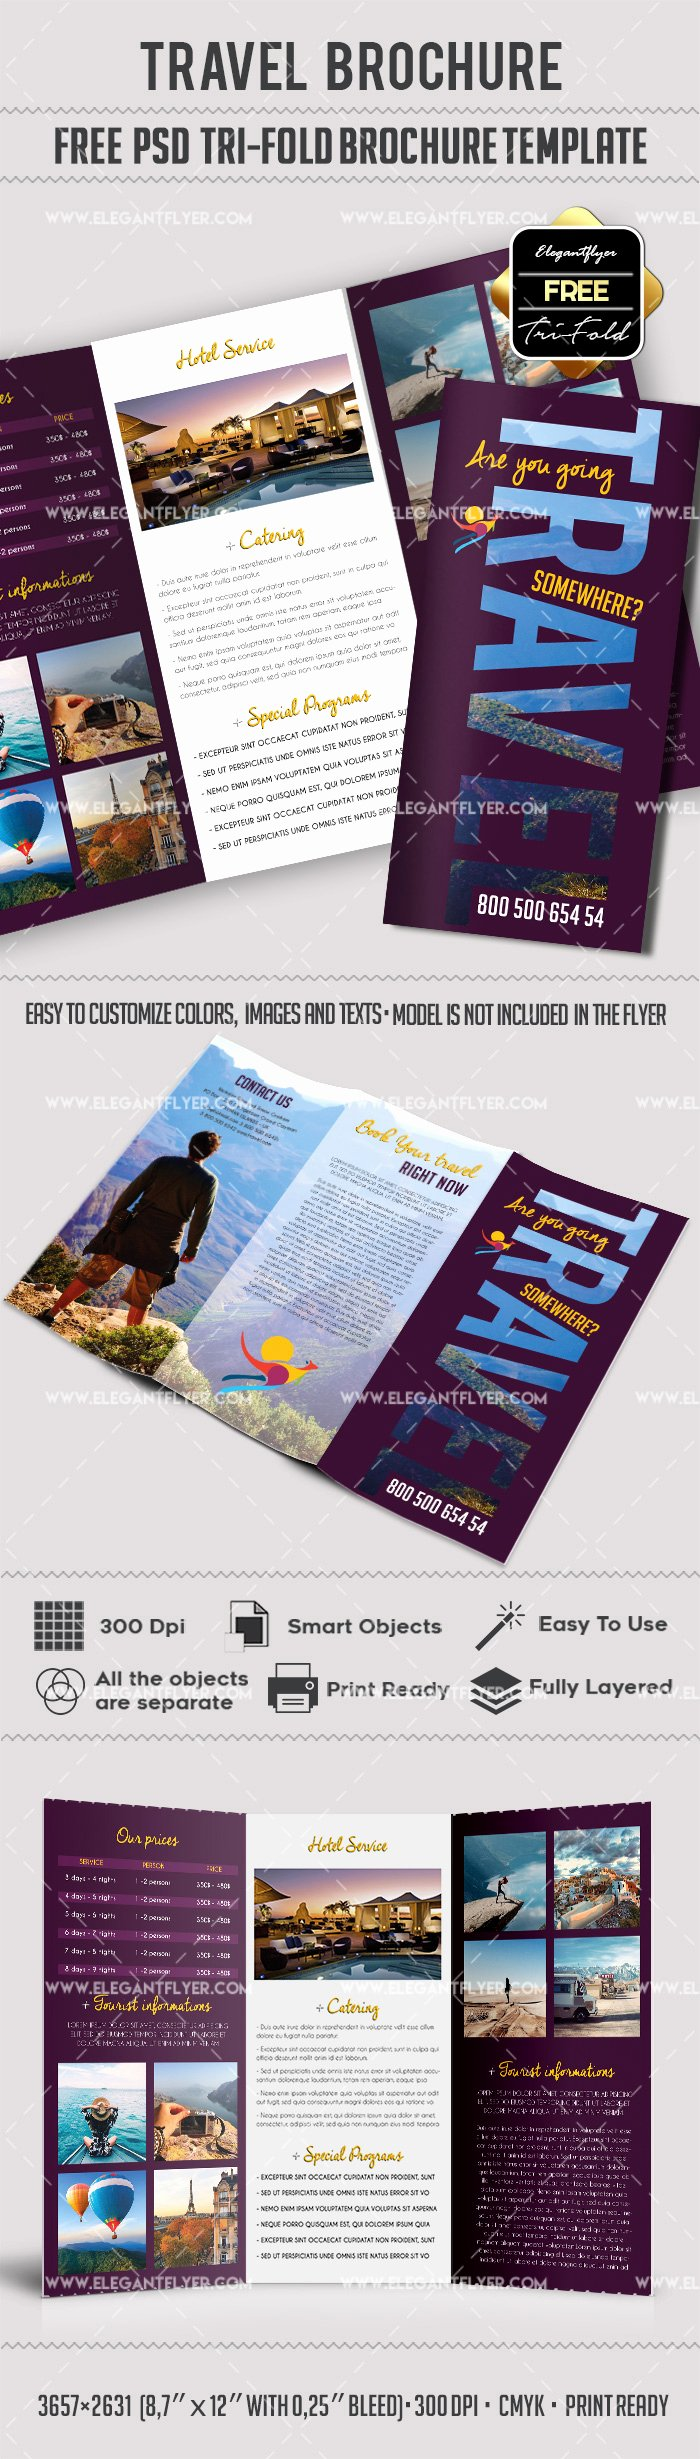 Tri Fold Travel Brochure Template Awesome Tri Fold Travel Brochure Template – by Elegantflyer